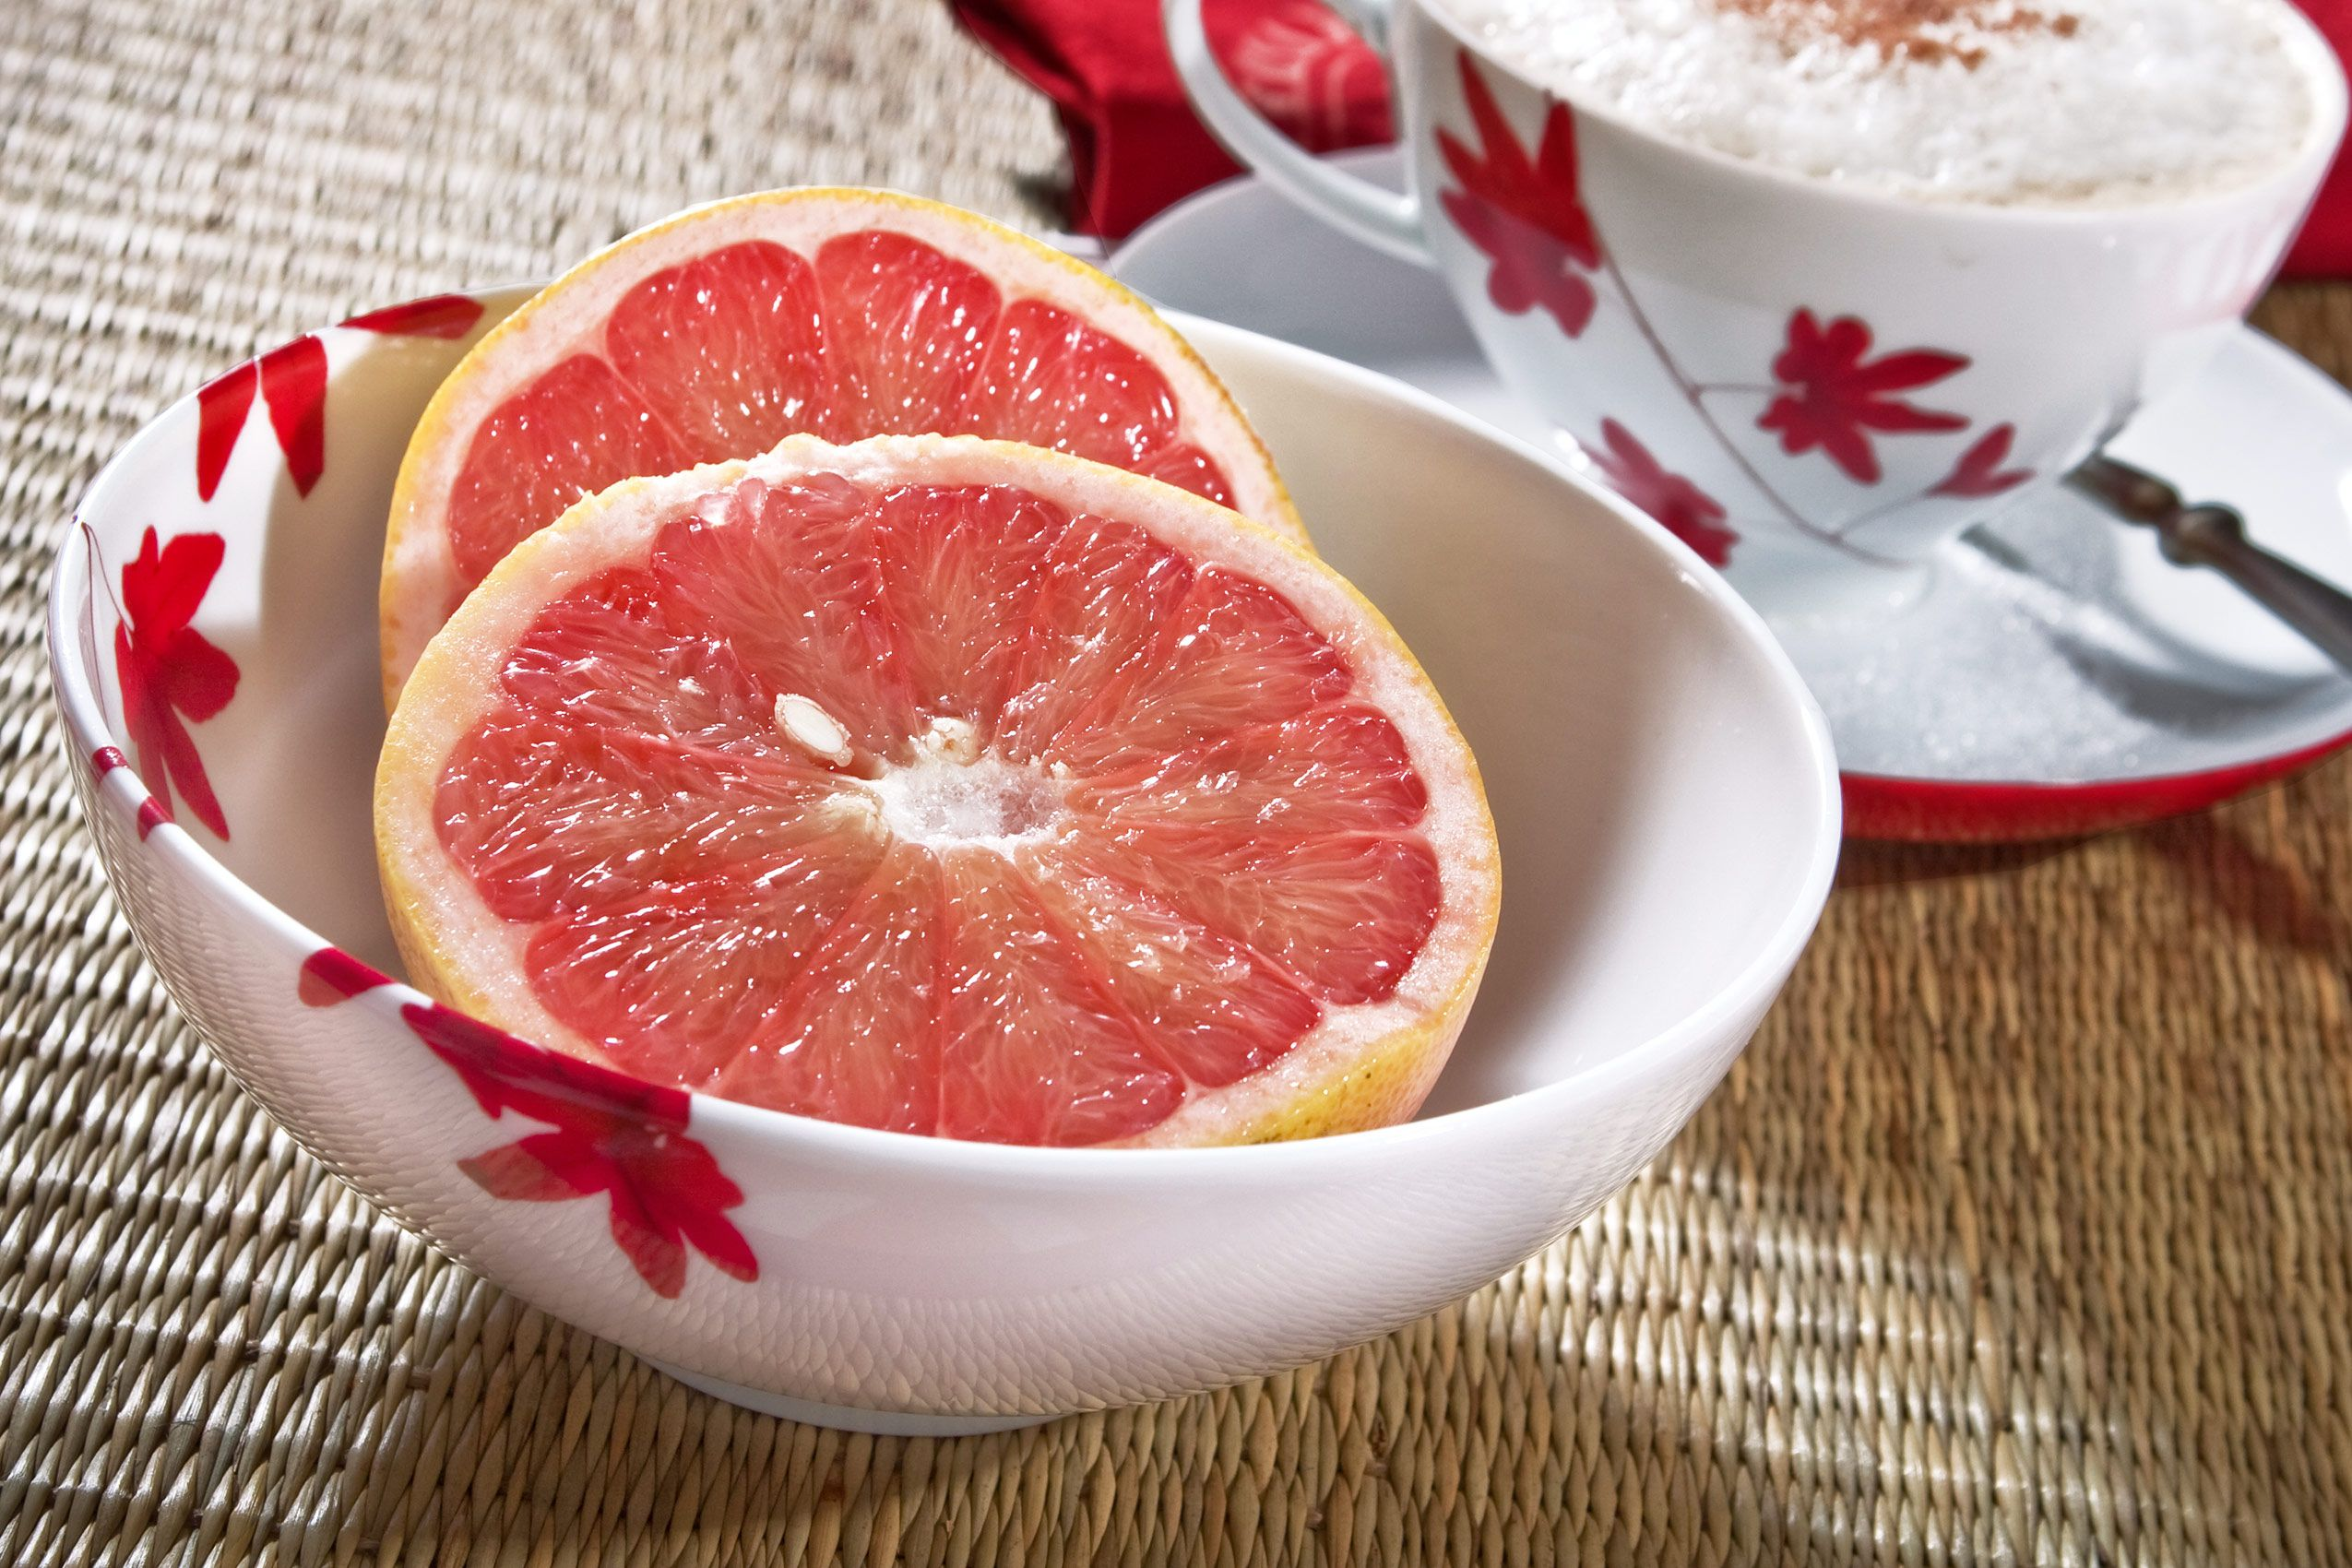 mikasapureredbowlwithgrapefruit.jpg